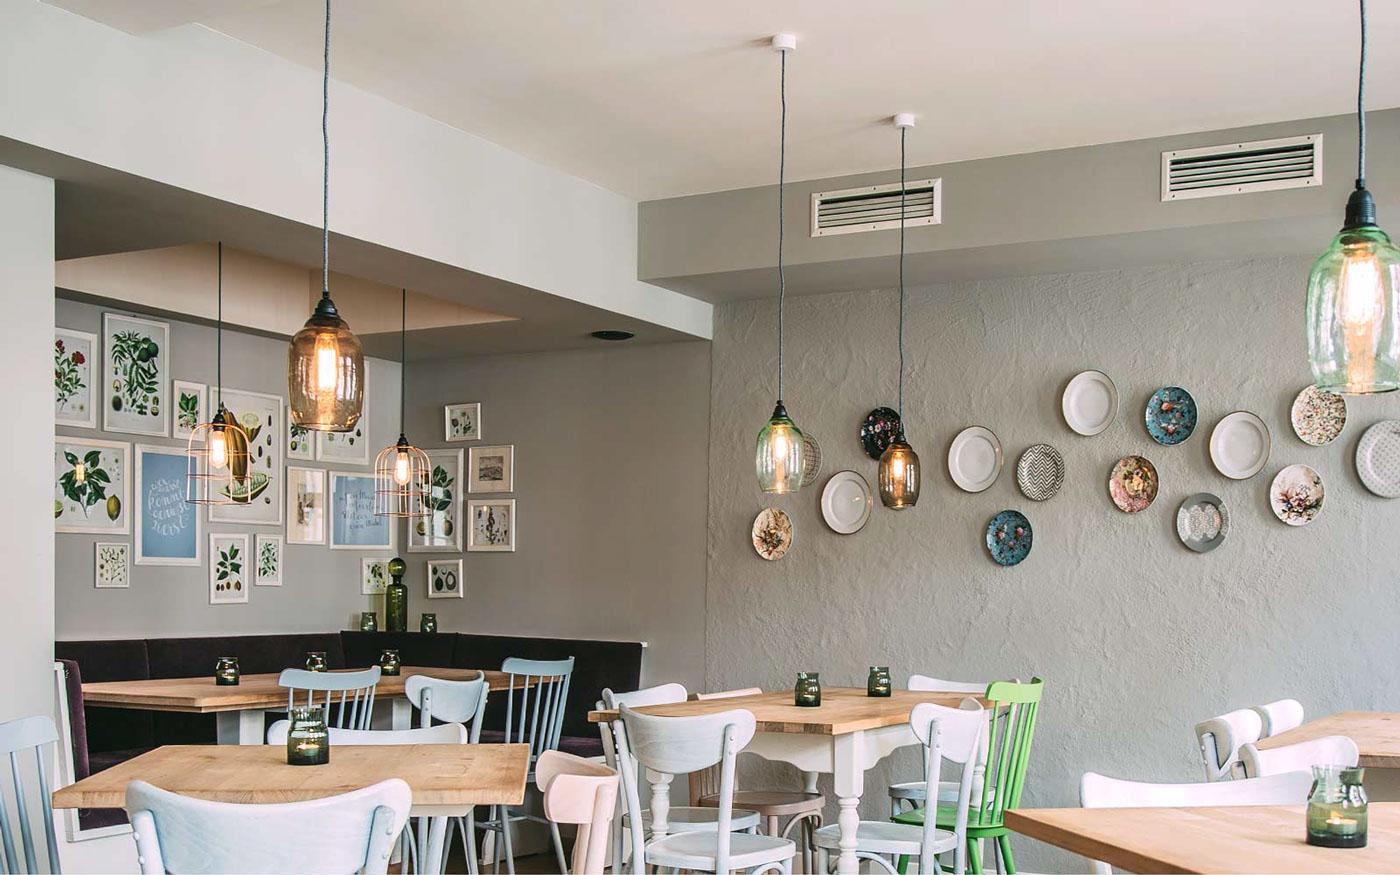 Gruener Michel-branding-interior design-hisheji (17)